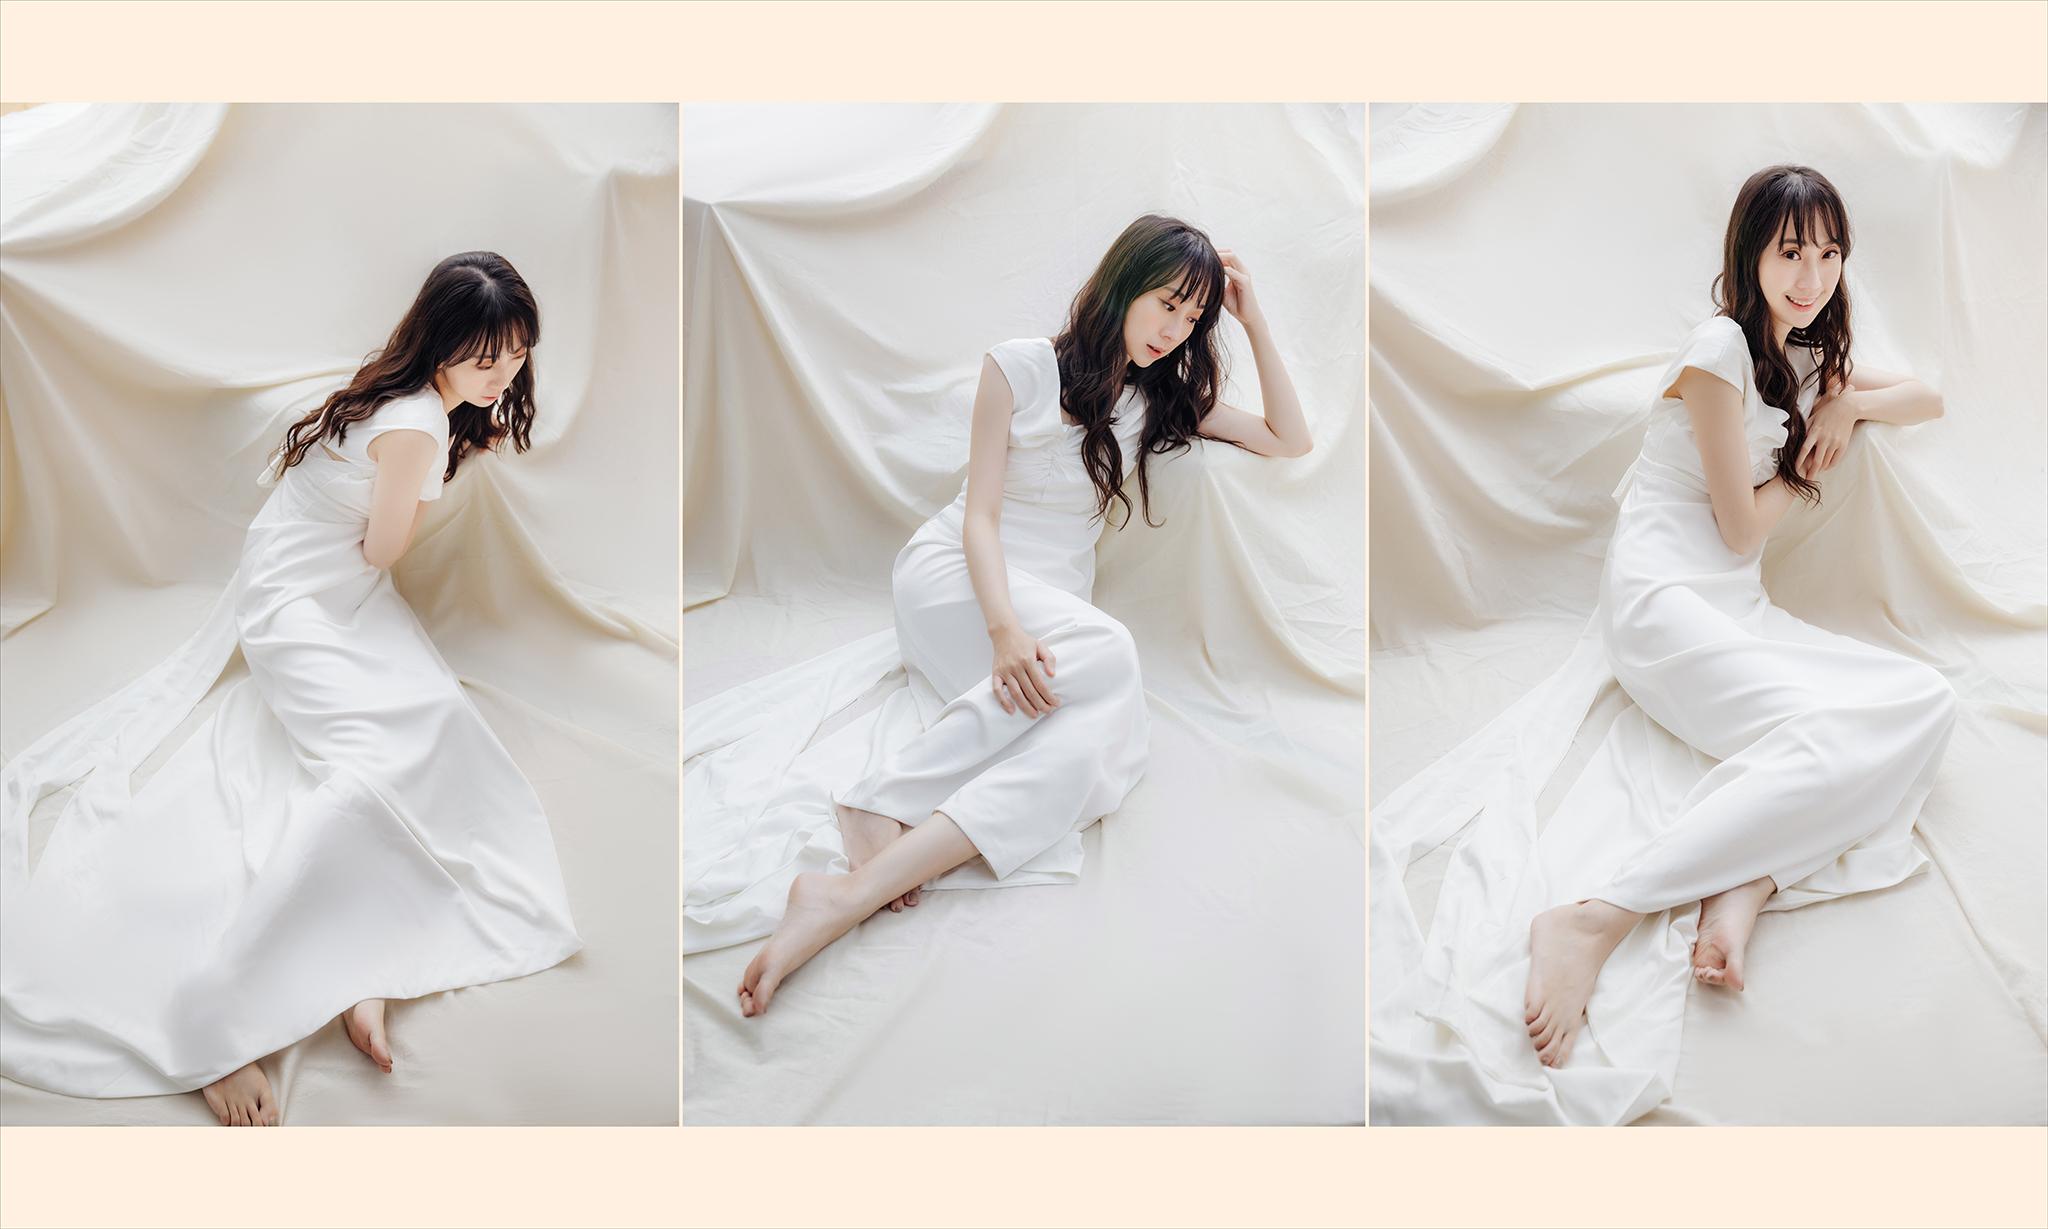 50660016056 336e273c56 o - 【自主婚紗】+Melody+